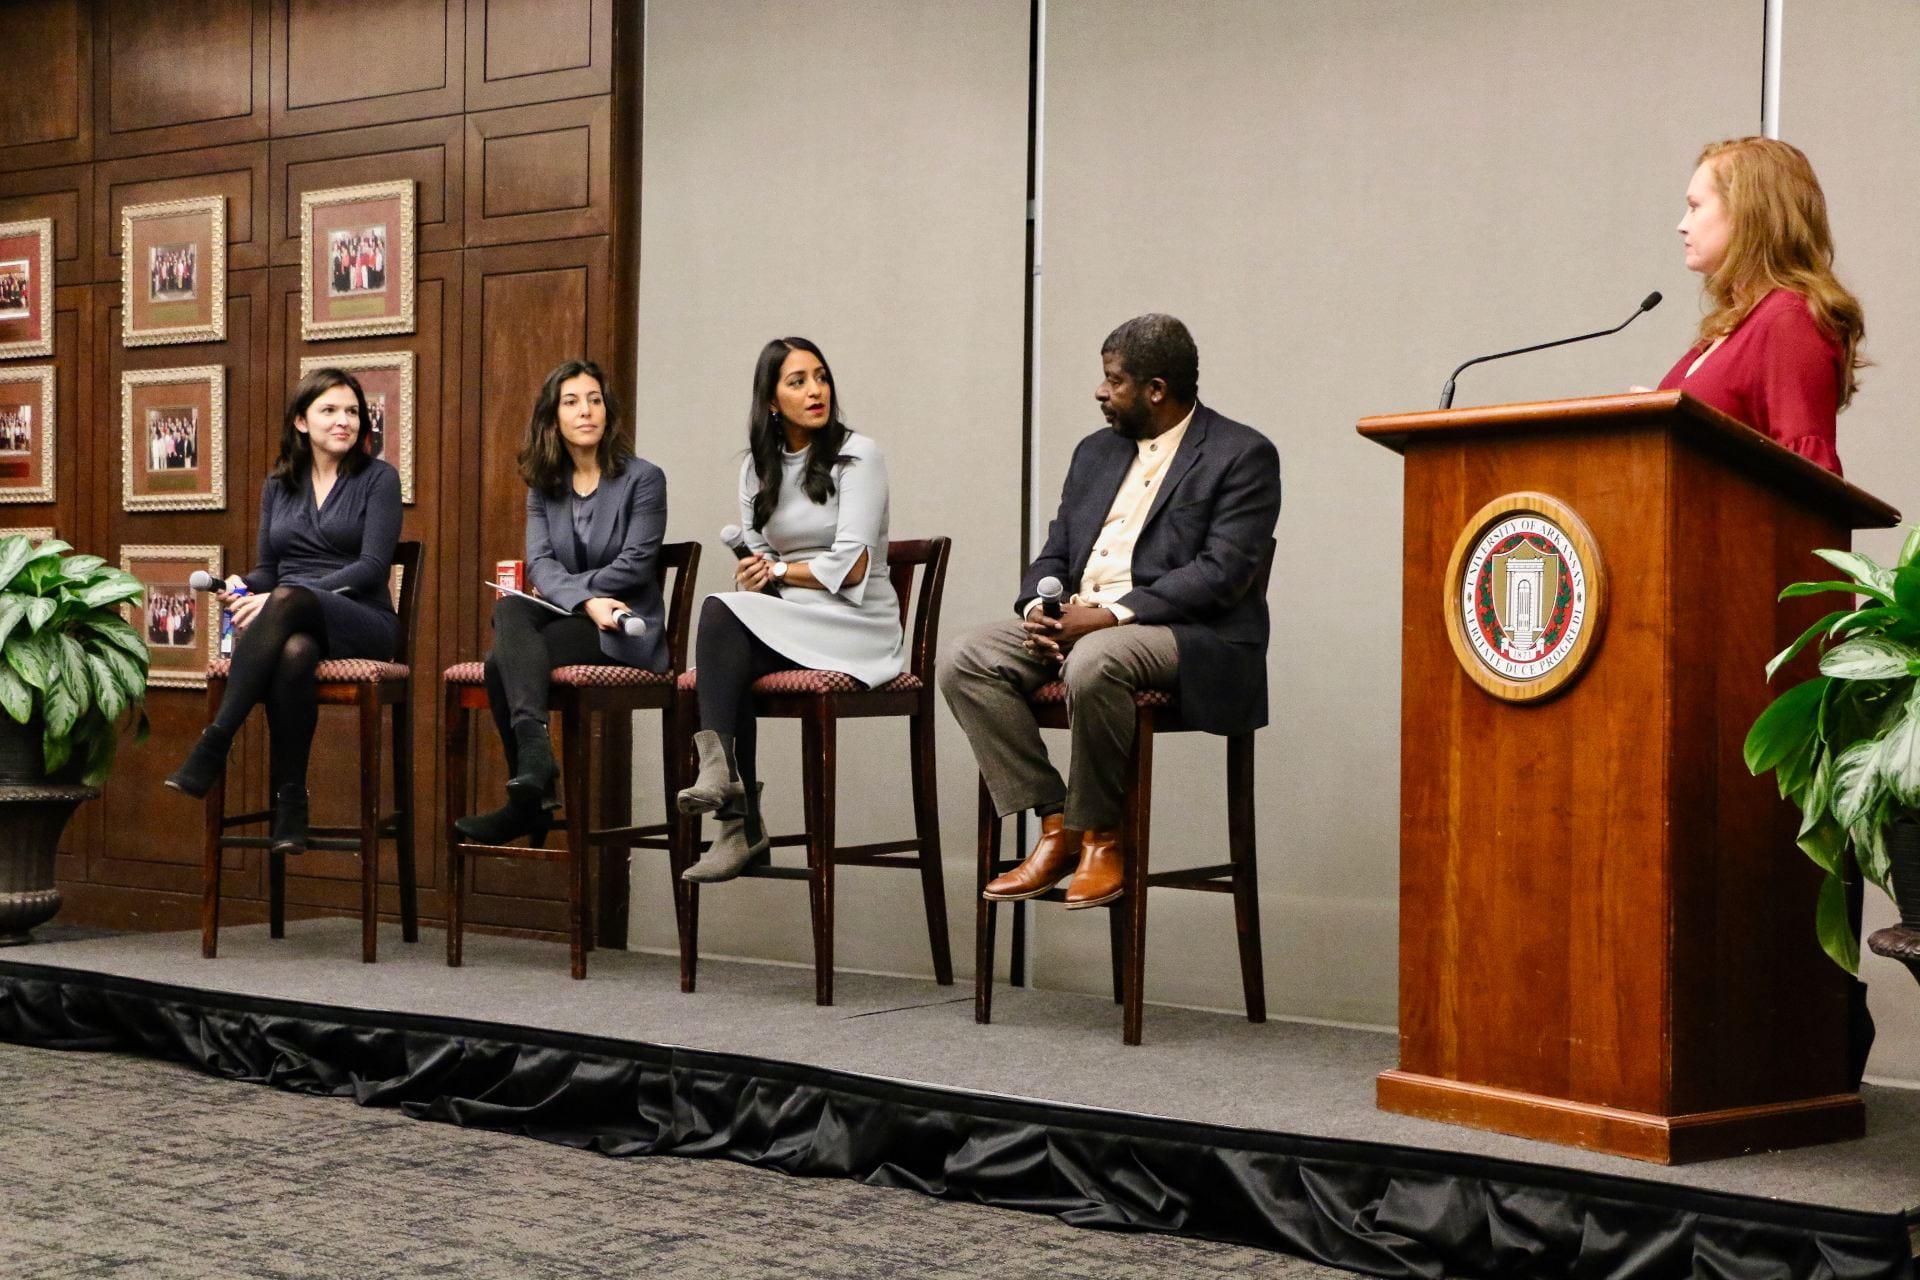 Center for Ethics Forum with journalists Arlette Saenz, Julie Hirschfeld-Davis, Sabrina Siddiqui and VDP Steven Holmes. The moderator is UA director of student media Robyn Starling-Ledbetter, Nov. 2018